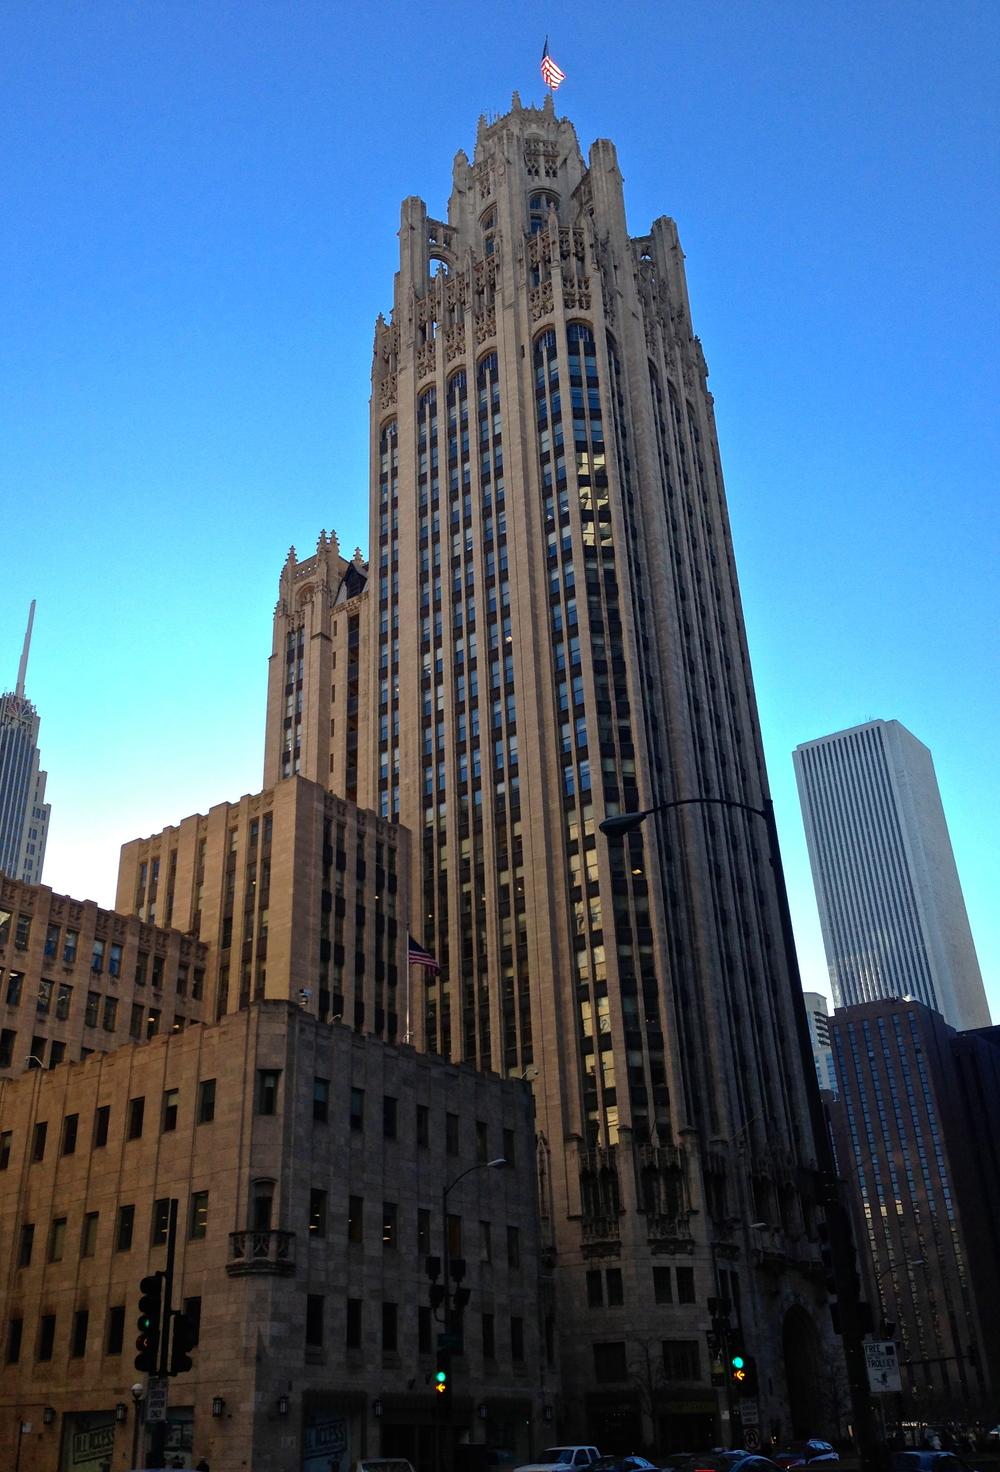 The Tribune Tower